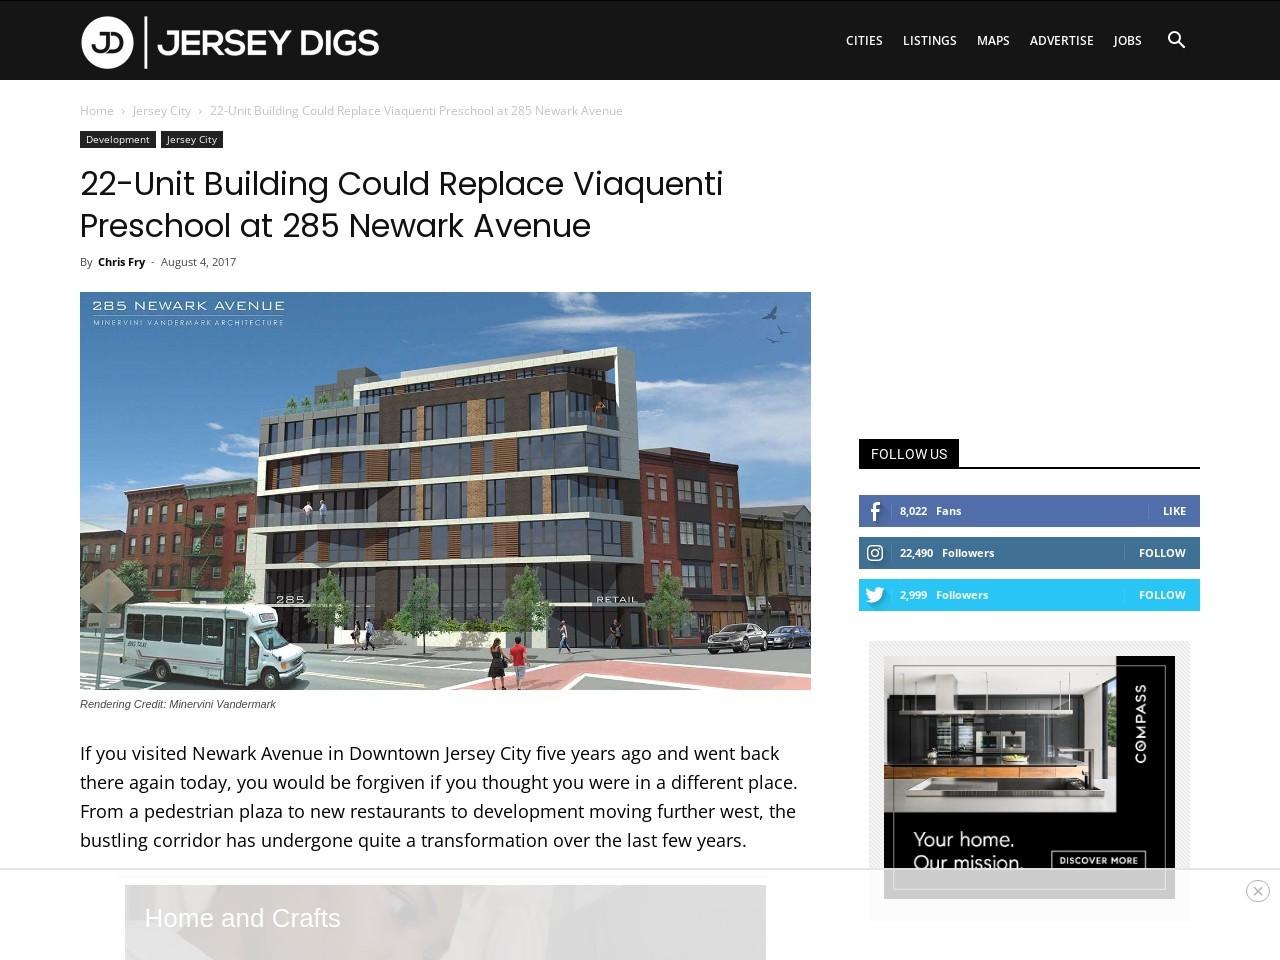 22-Unit Building Could Replace Viaquenti Preschool at 285 Newark Avenue